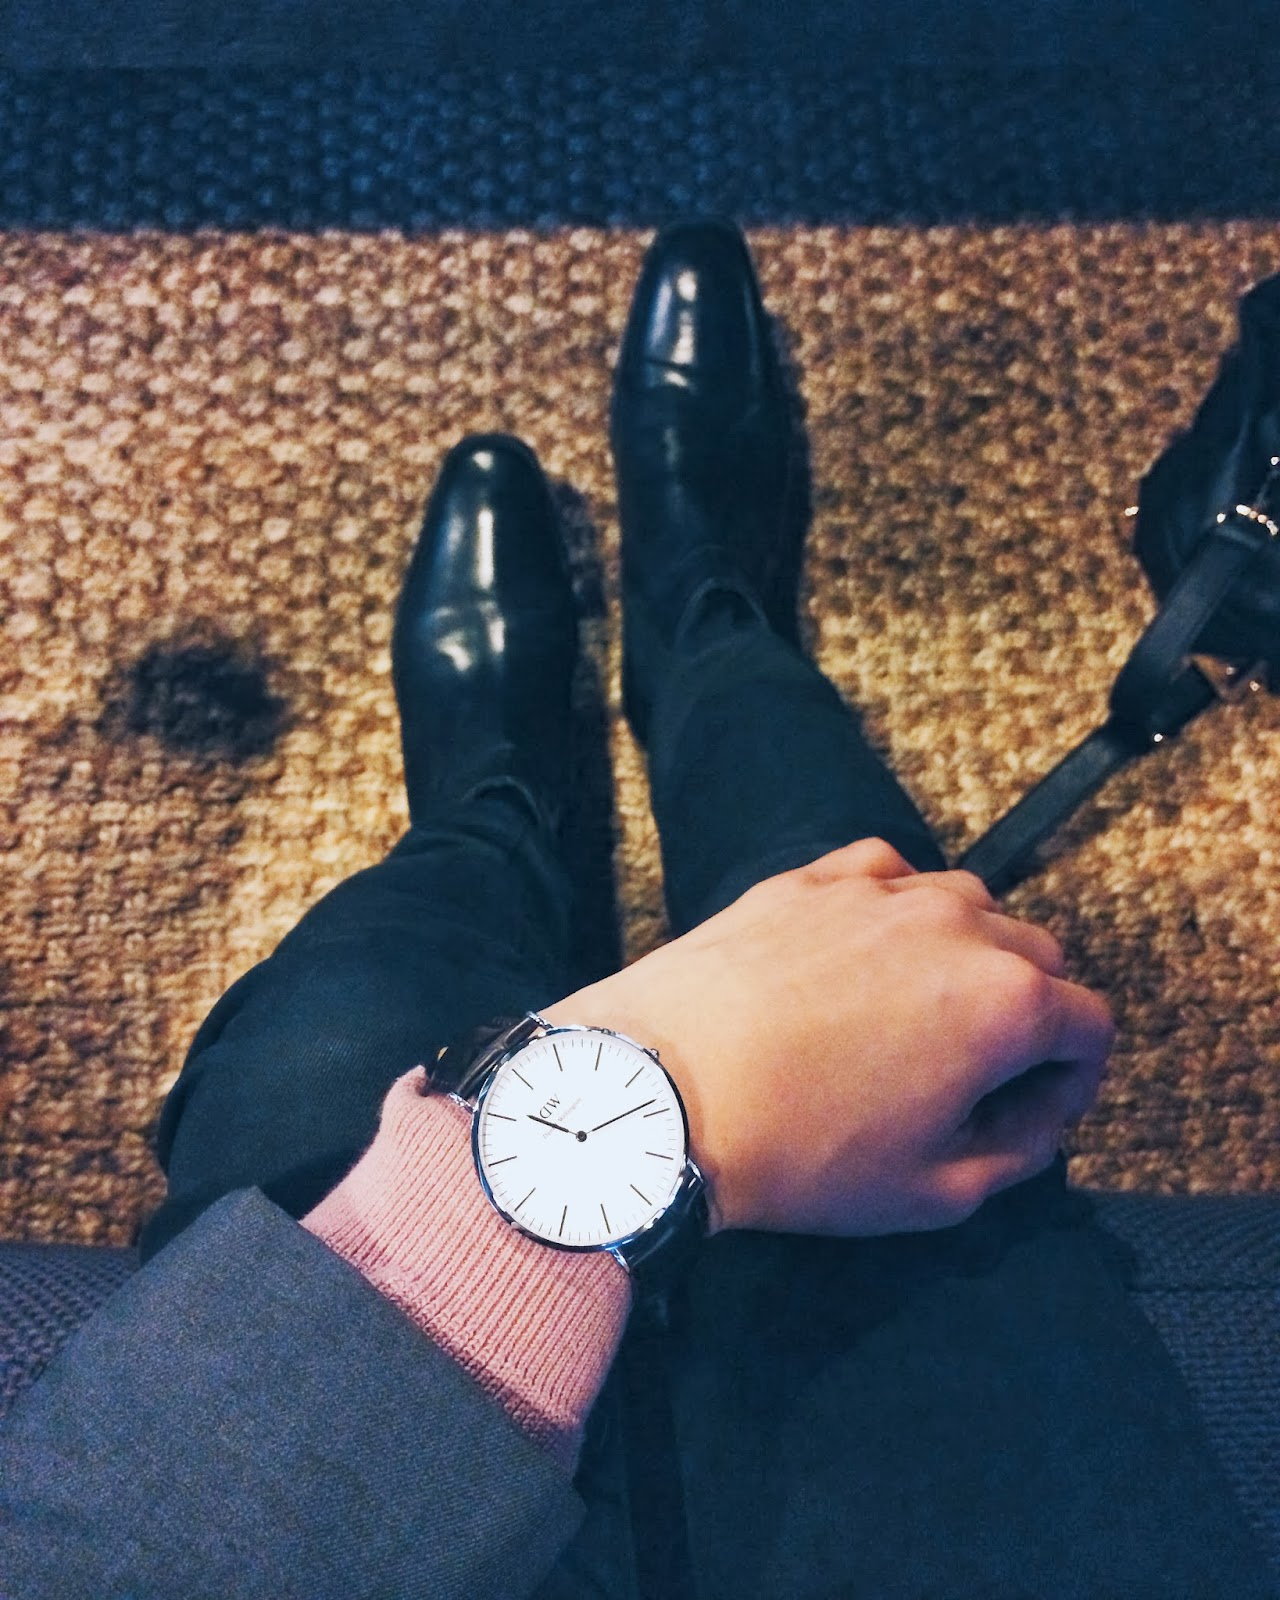 mybelonging-menswearblogger-danielwellington-watch.JPG